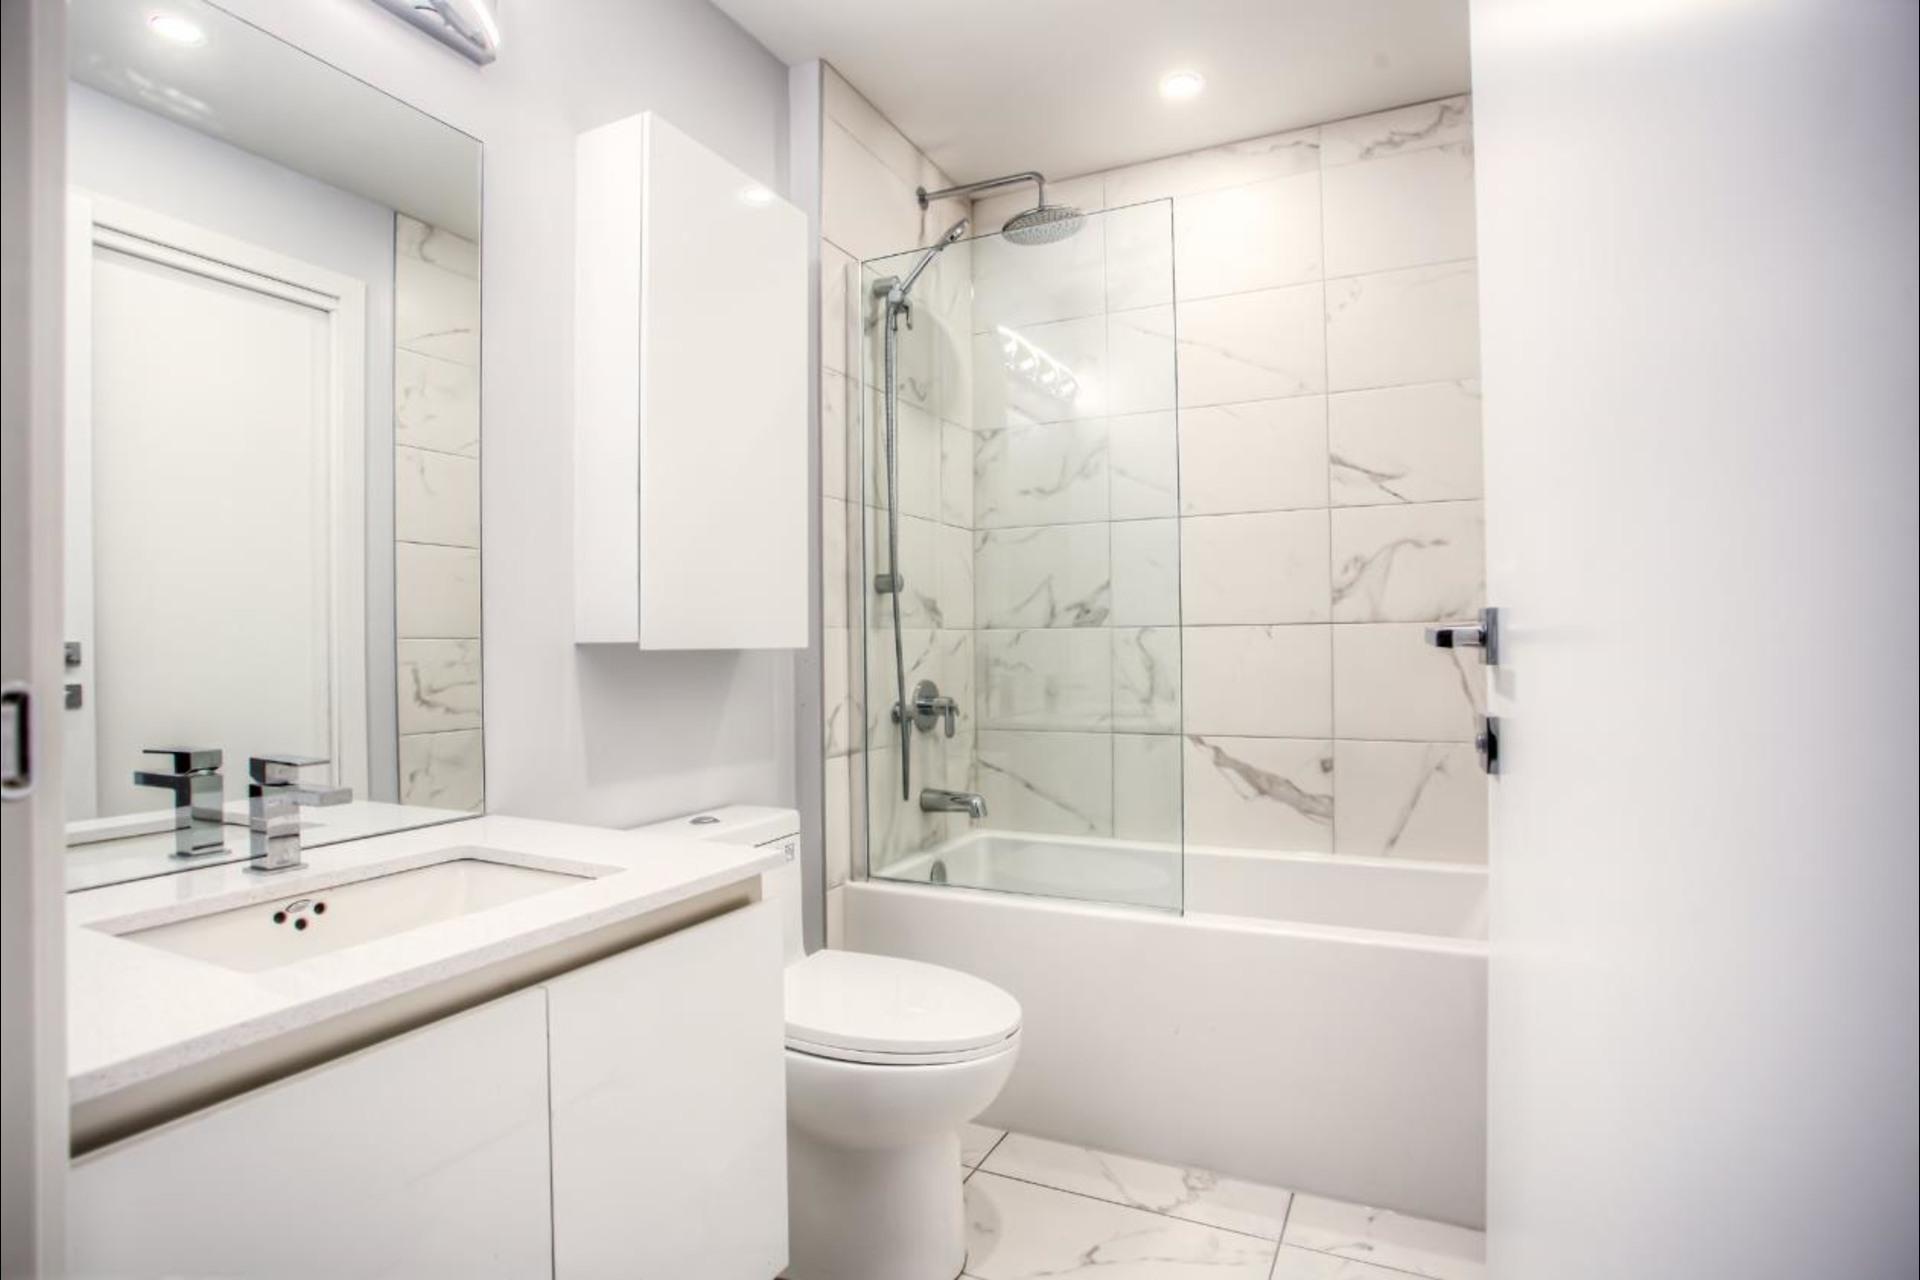 image 8 - 公寓 出租 Montréal - 6 室